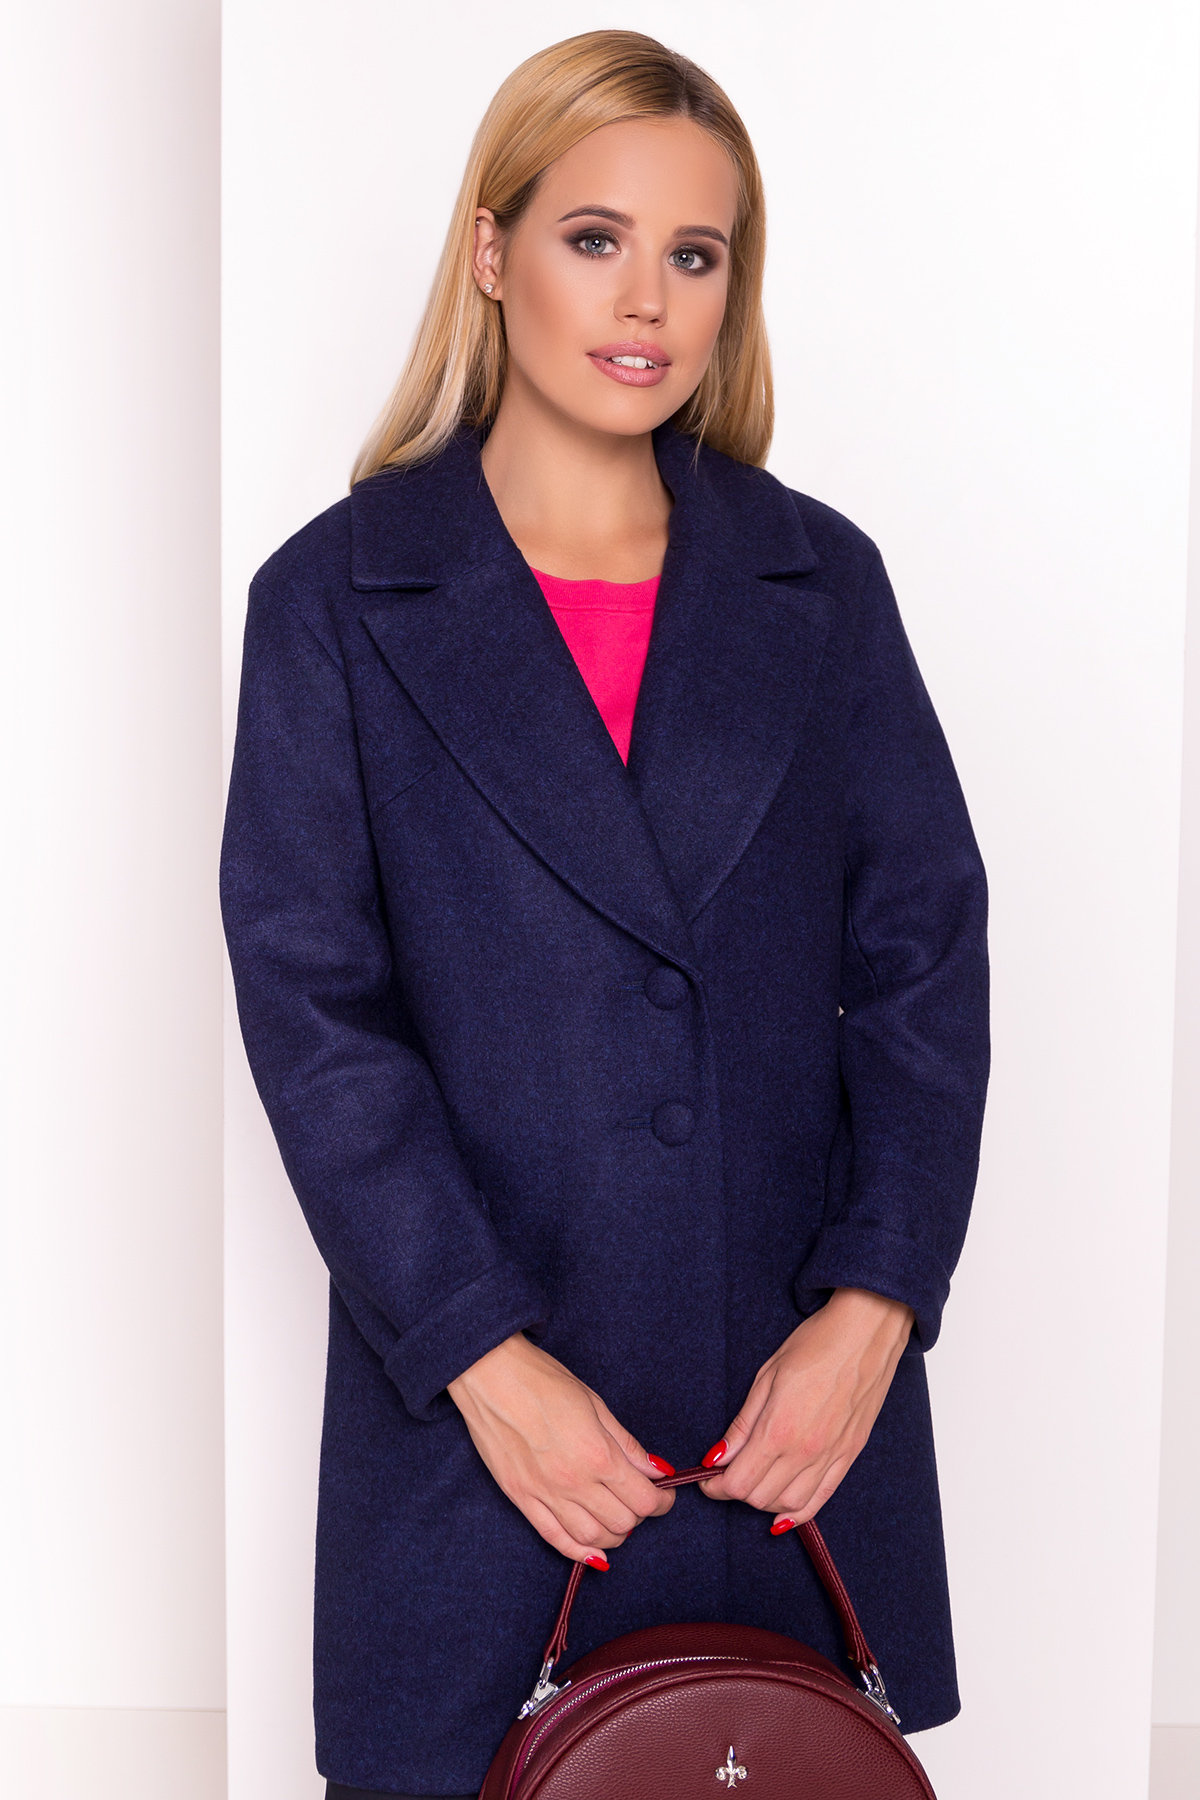 Демисезонное пальто Вива 4558 АРТ. 37261 Цвет: Темно-синий 17 - фото 3, интернет магазин tm-modus.ru